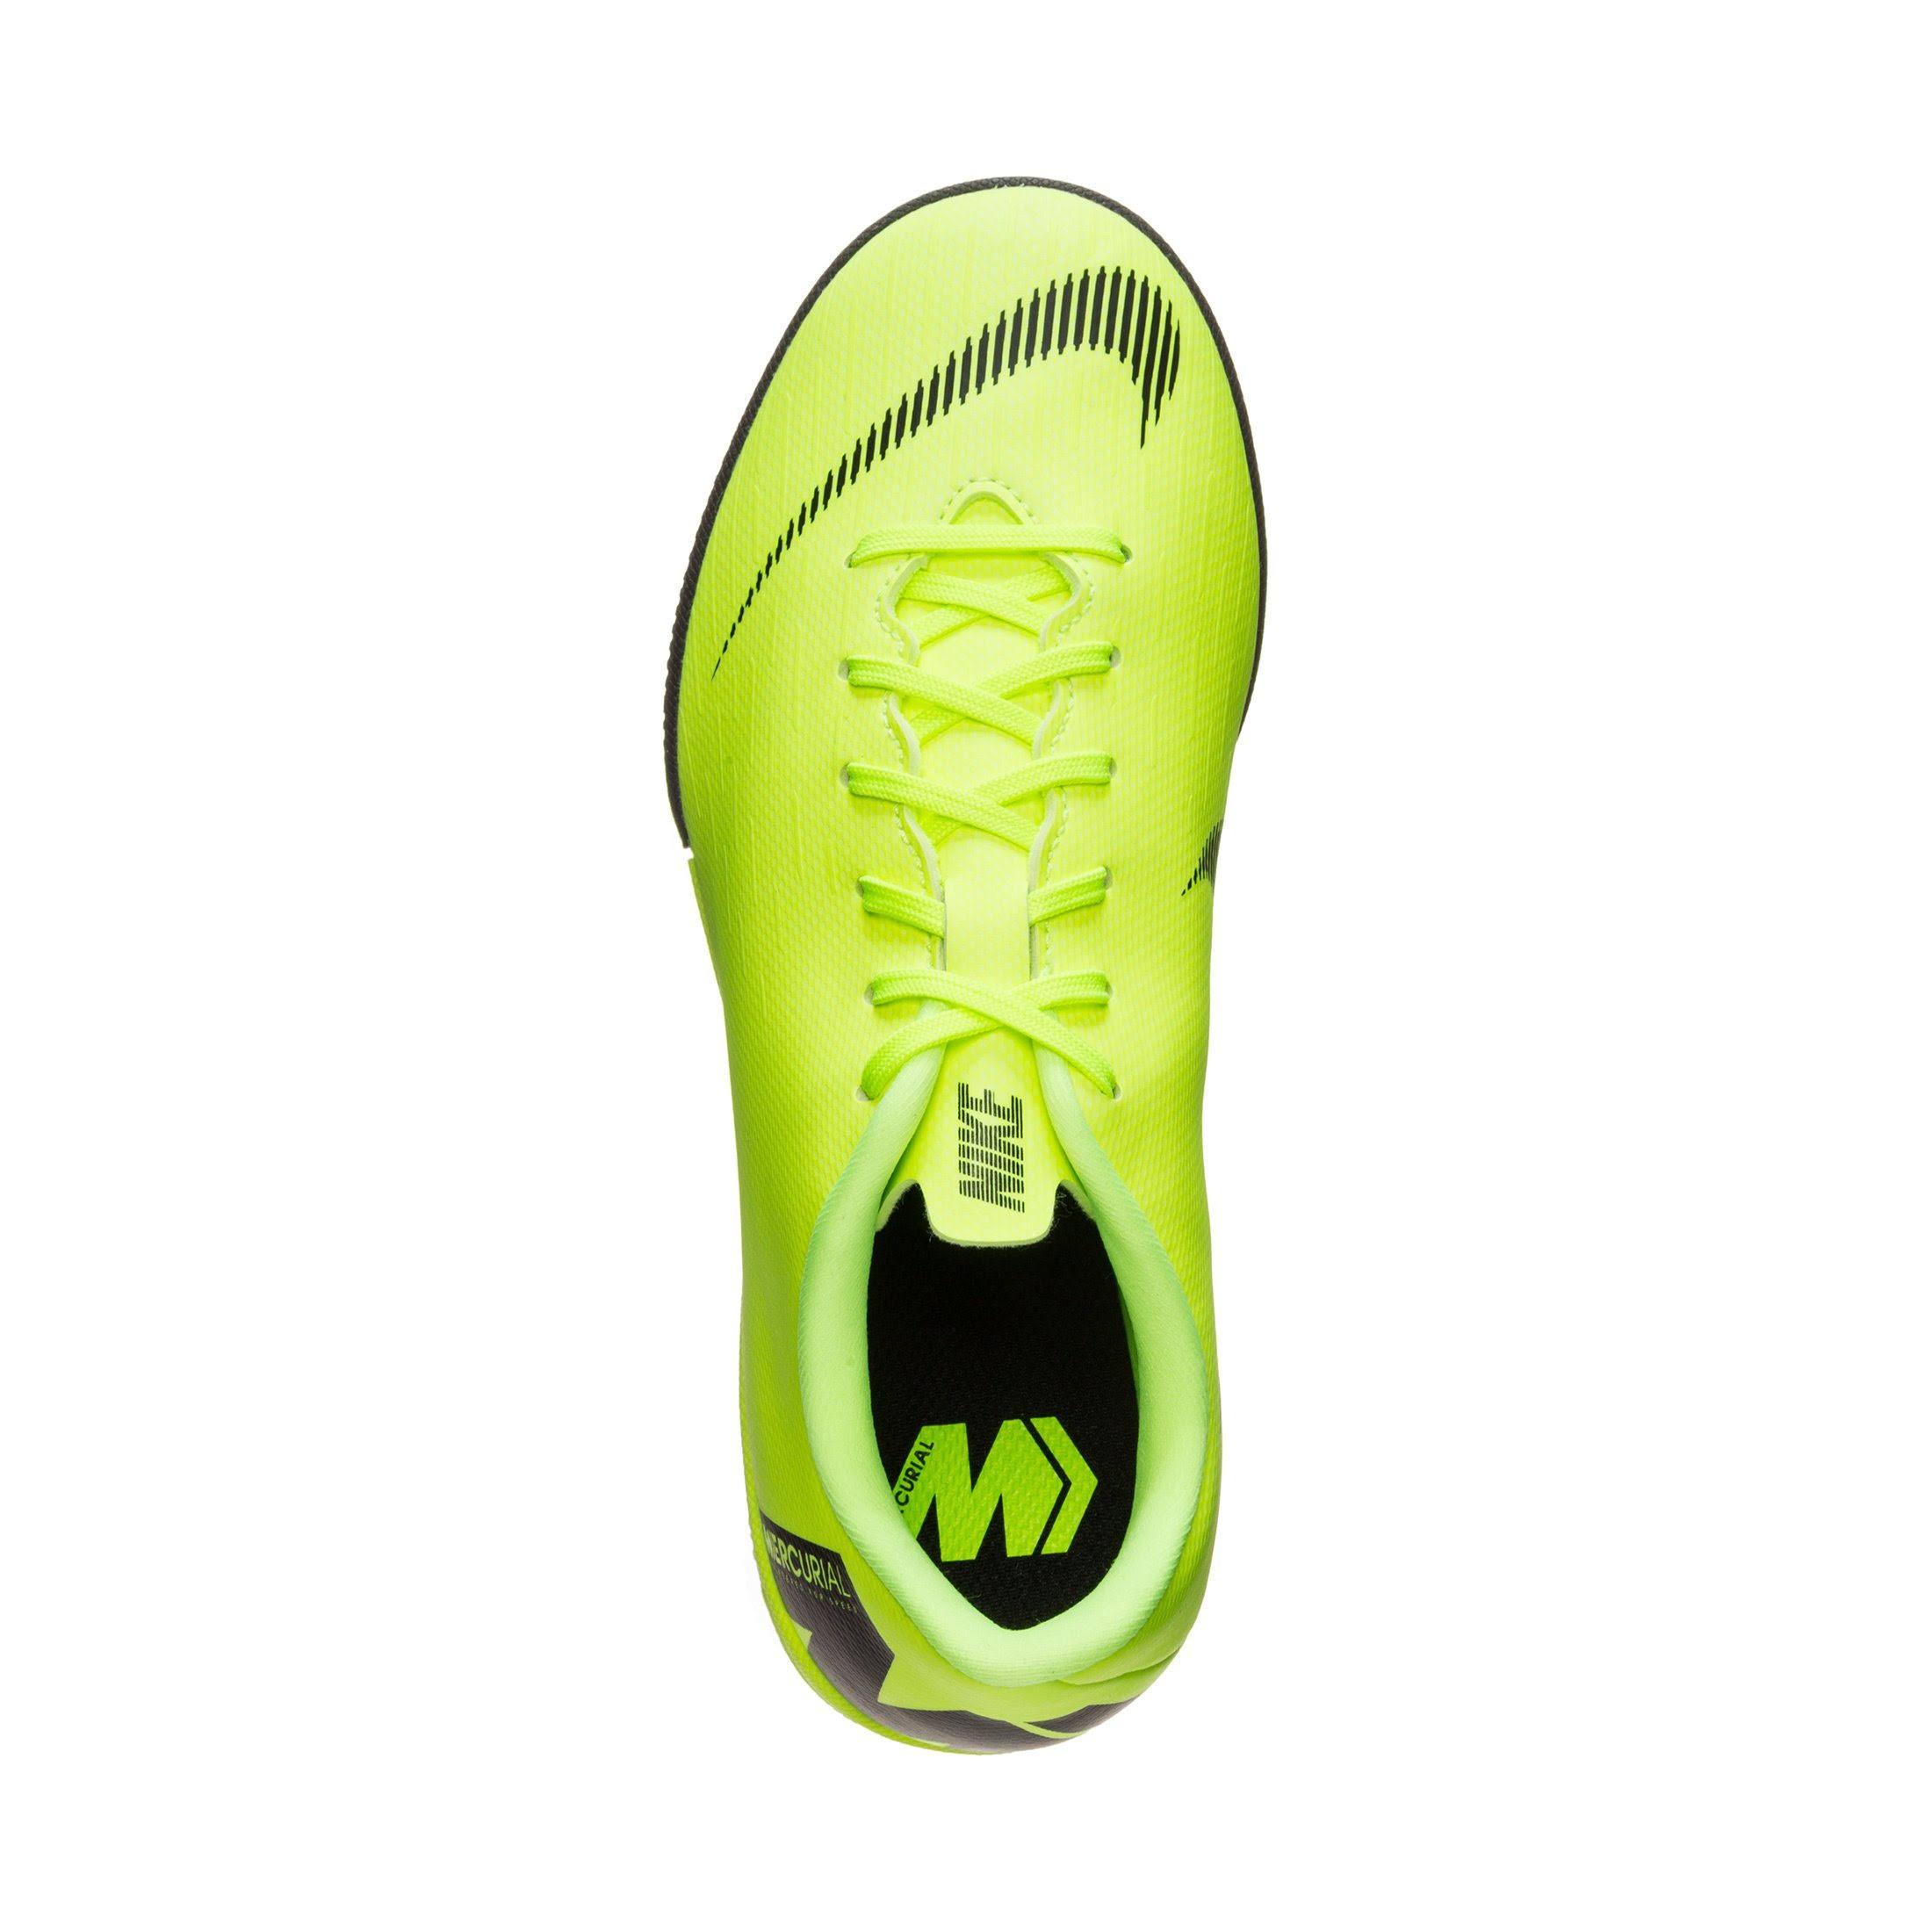 Kinder Ic Fußballschuhe Xii Mercurialx Gs Gelb Jr Nike Academy Vapor qY7680T